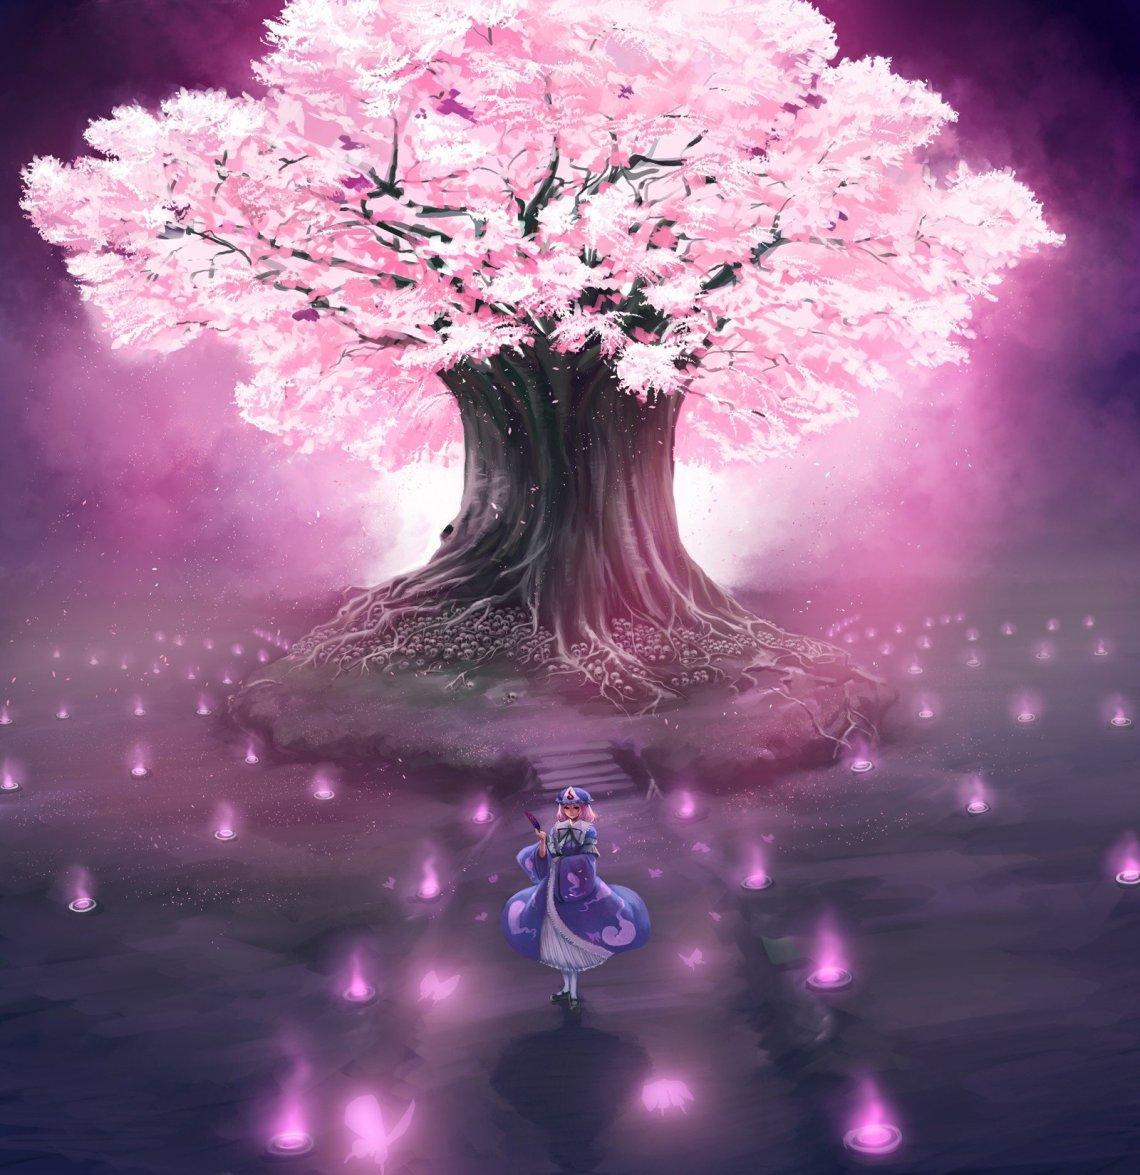 Download Mobile Wallpaper Anime Girls Sakura For Anime Cherry Blossom Tree 700x721 Wallpaper Teahub Io